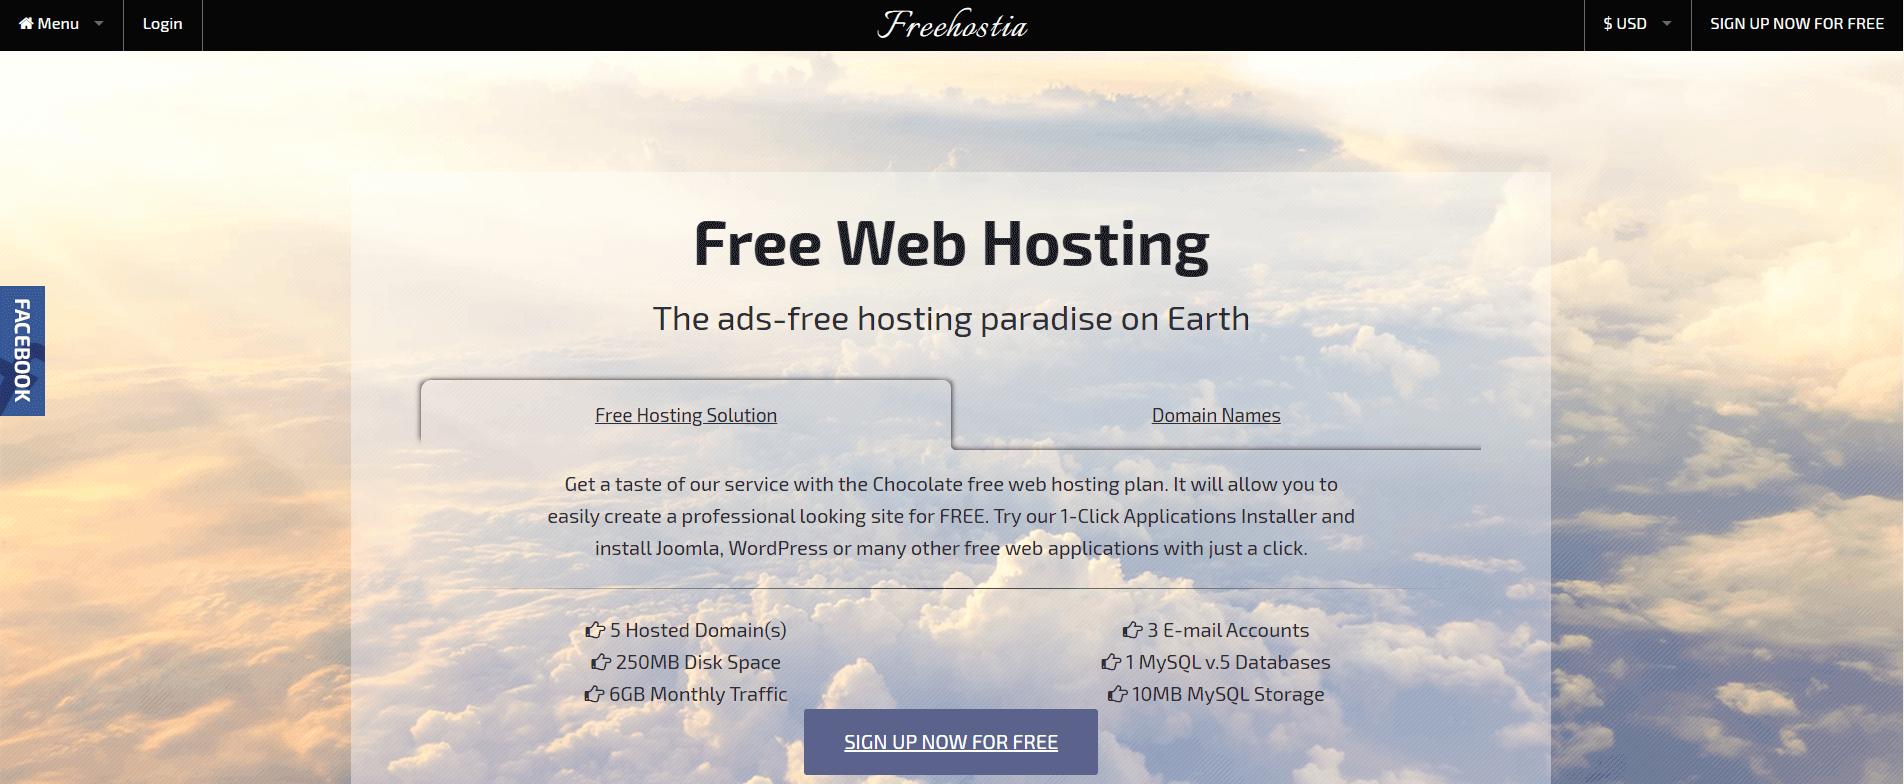 Freehostia的免费虚拟主机